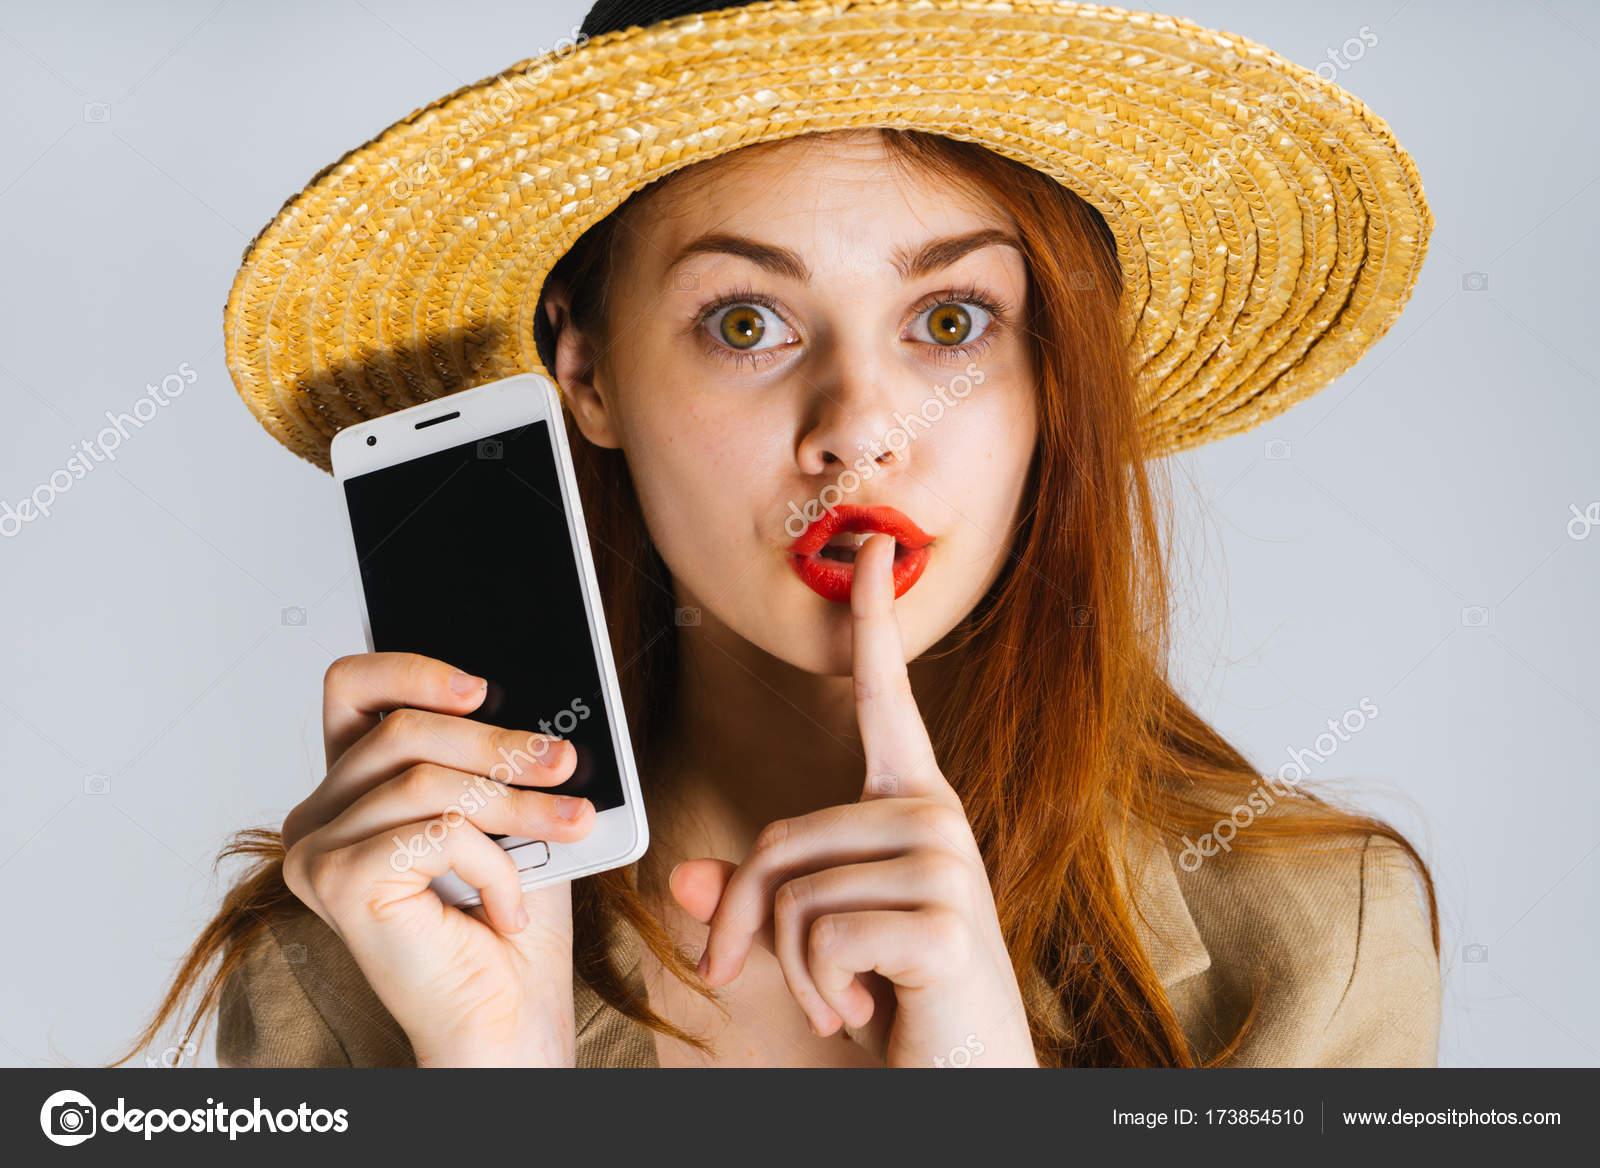 af4ca12a8b9 ένα αστείο κορίτσι με κόκκινα χείλη και σε ένα μεγάλο καπέλο κρατά ...